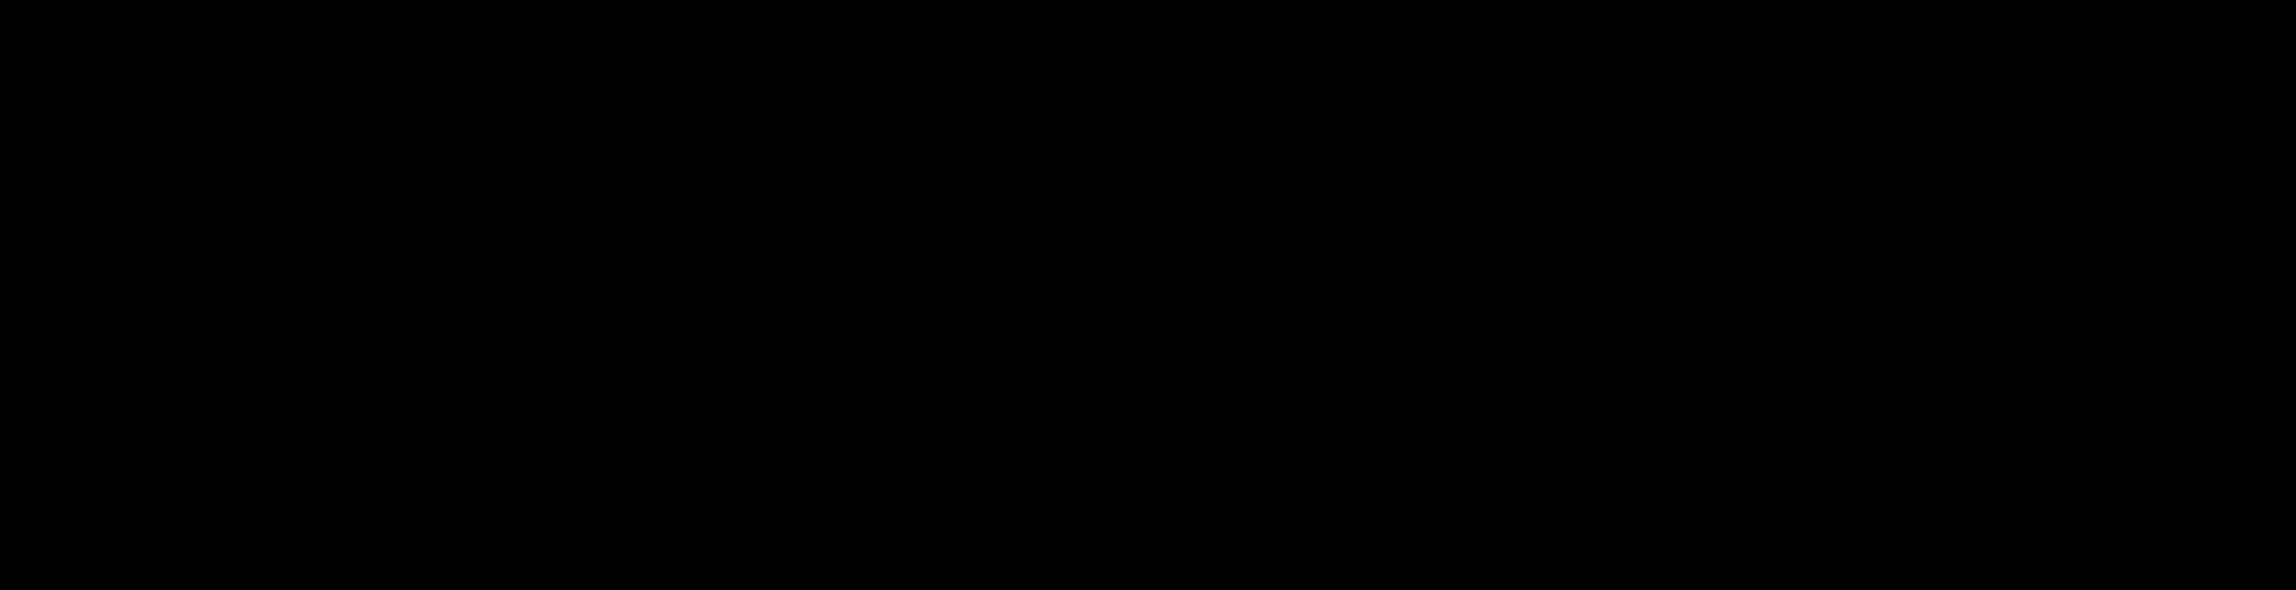 2296x590 Clipart